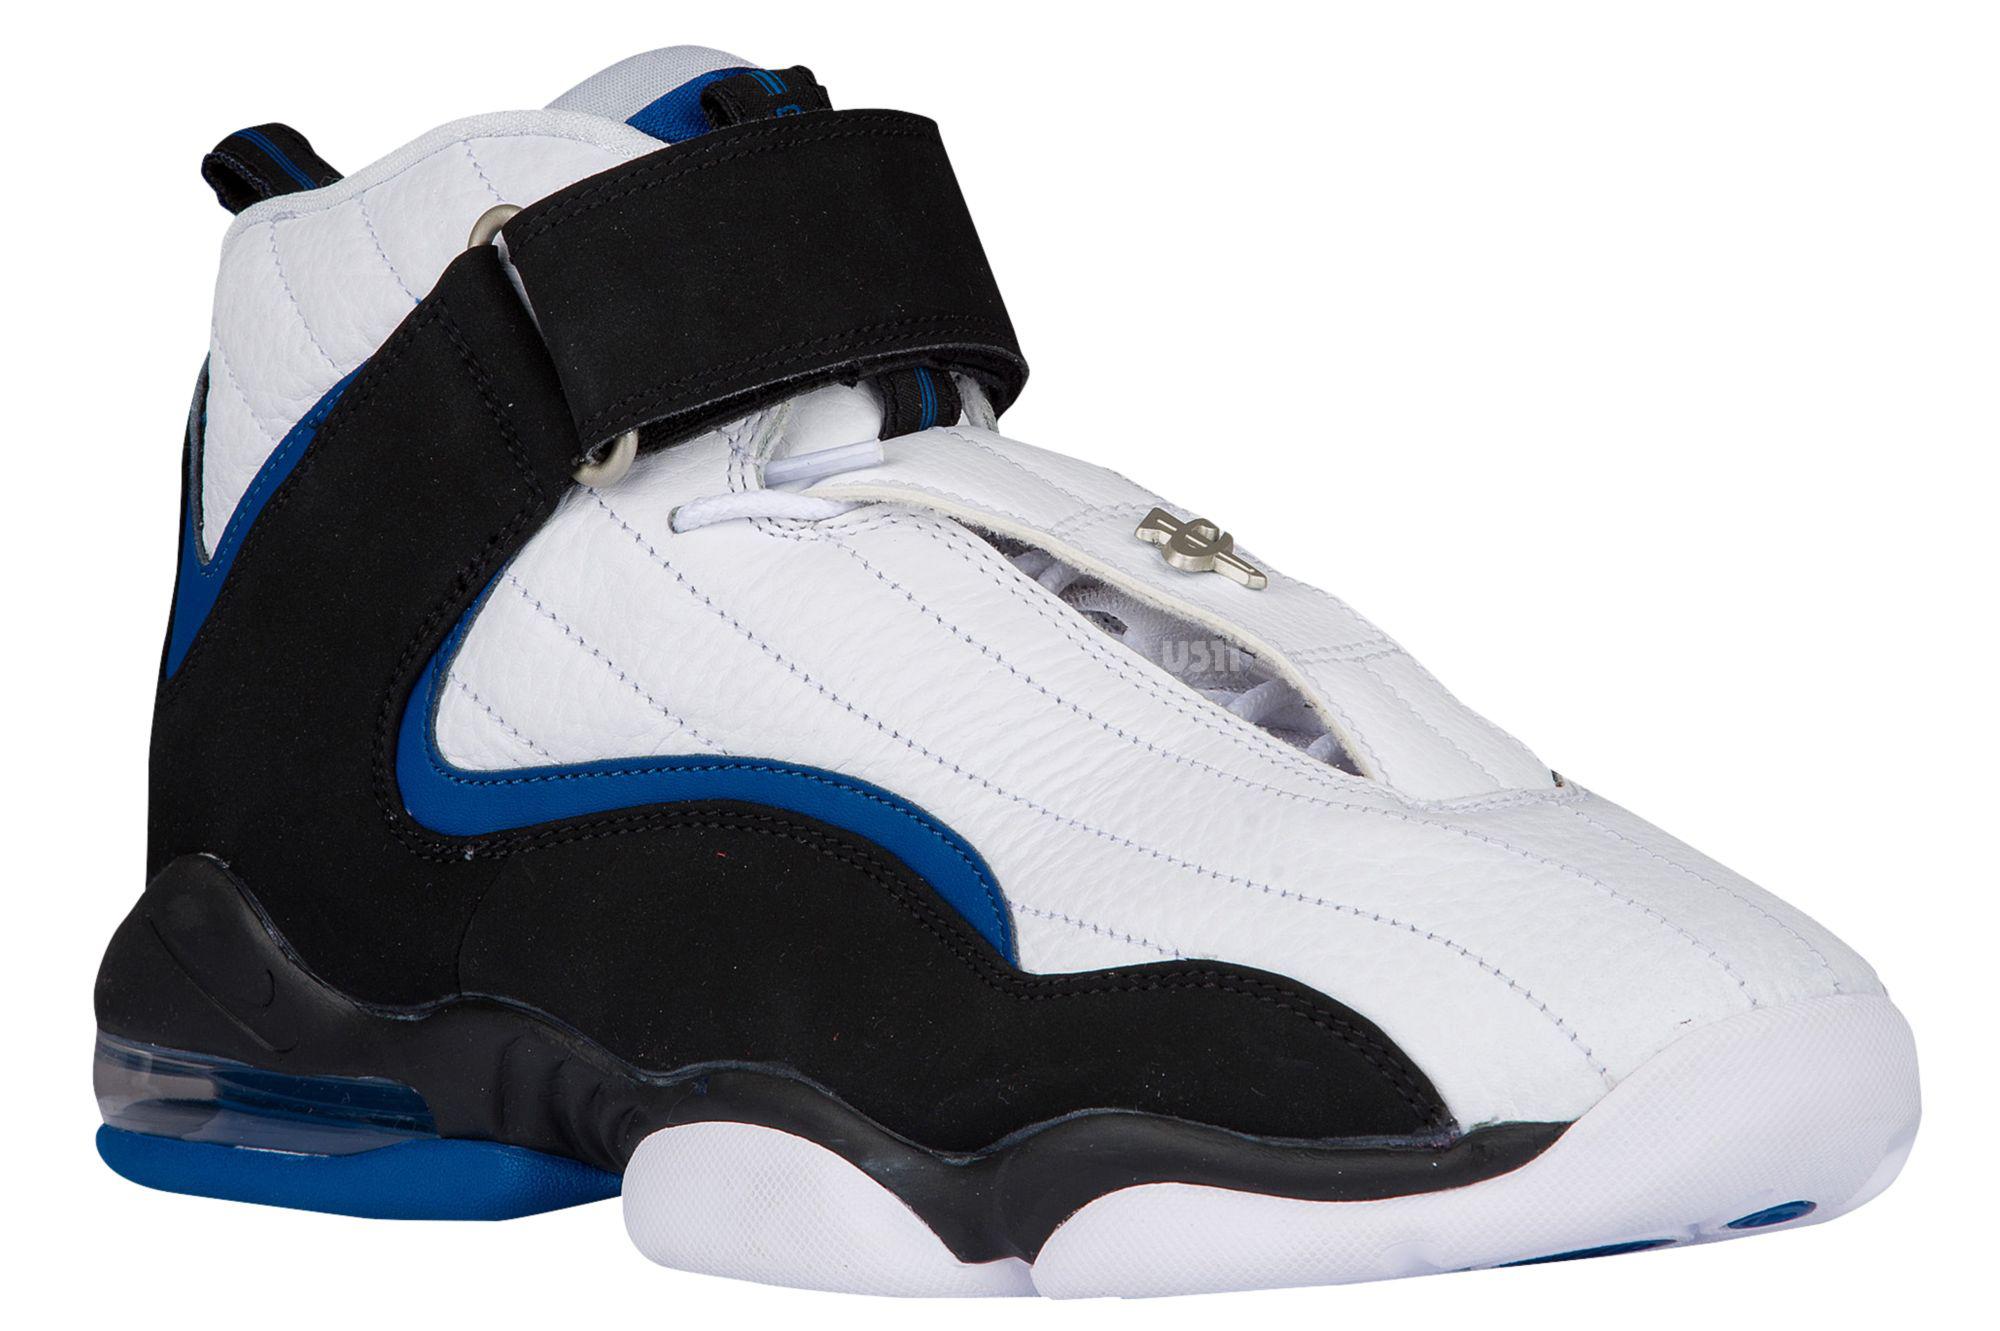 dc9a5a283cacd4 Nike Air Penny 4 2017 White Black Blue Orlando Side